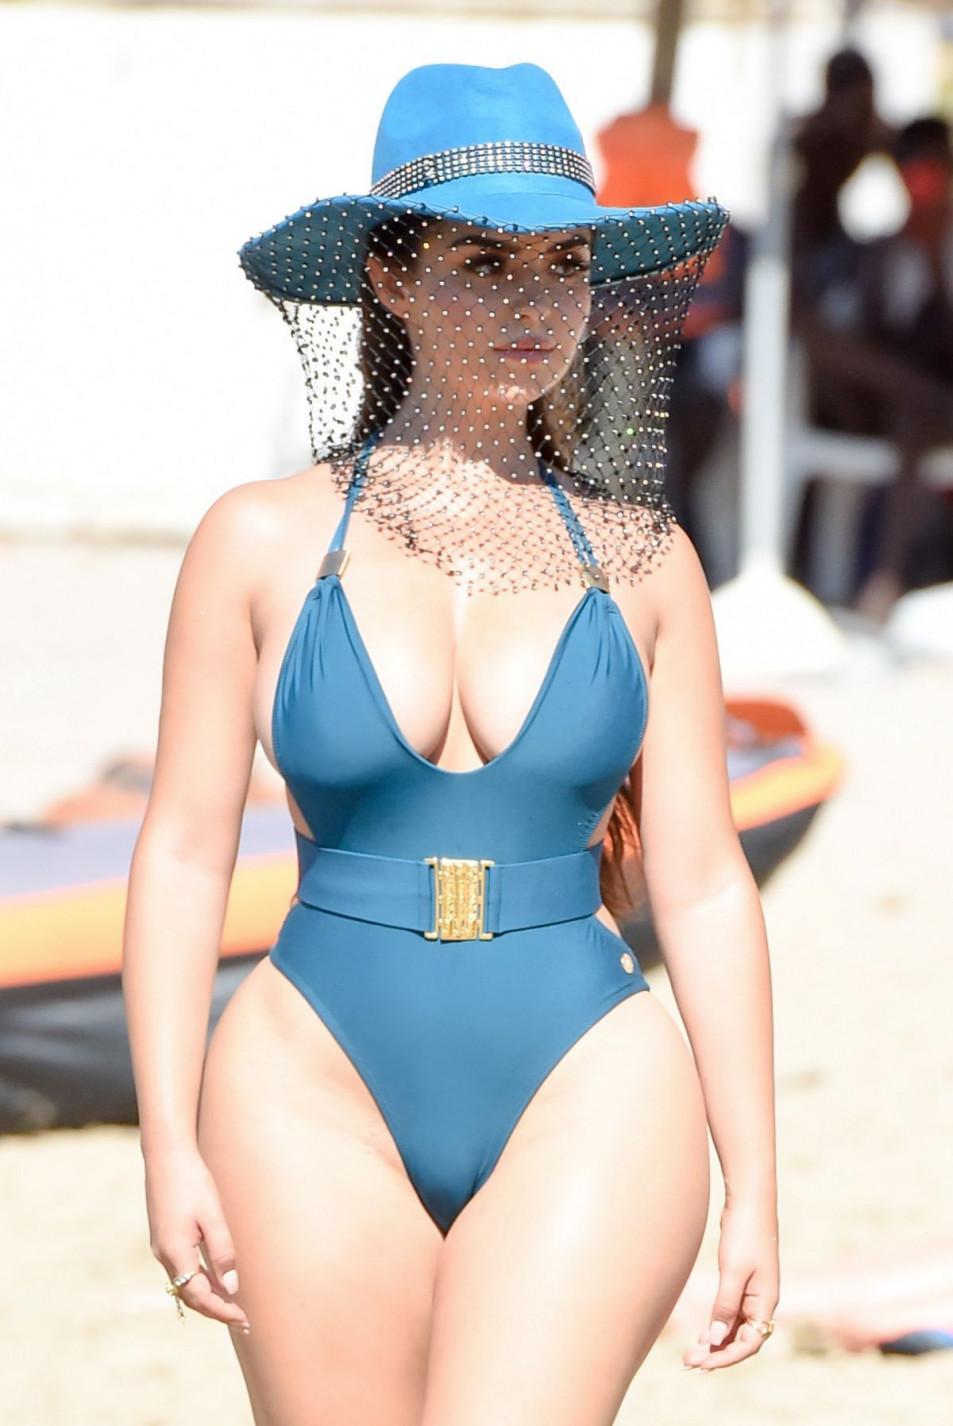 Demi-Rose-Mawby-swimsuit-photo-shoot-2.jpg